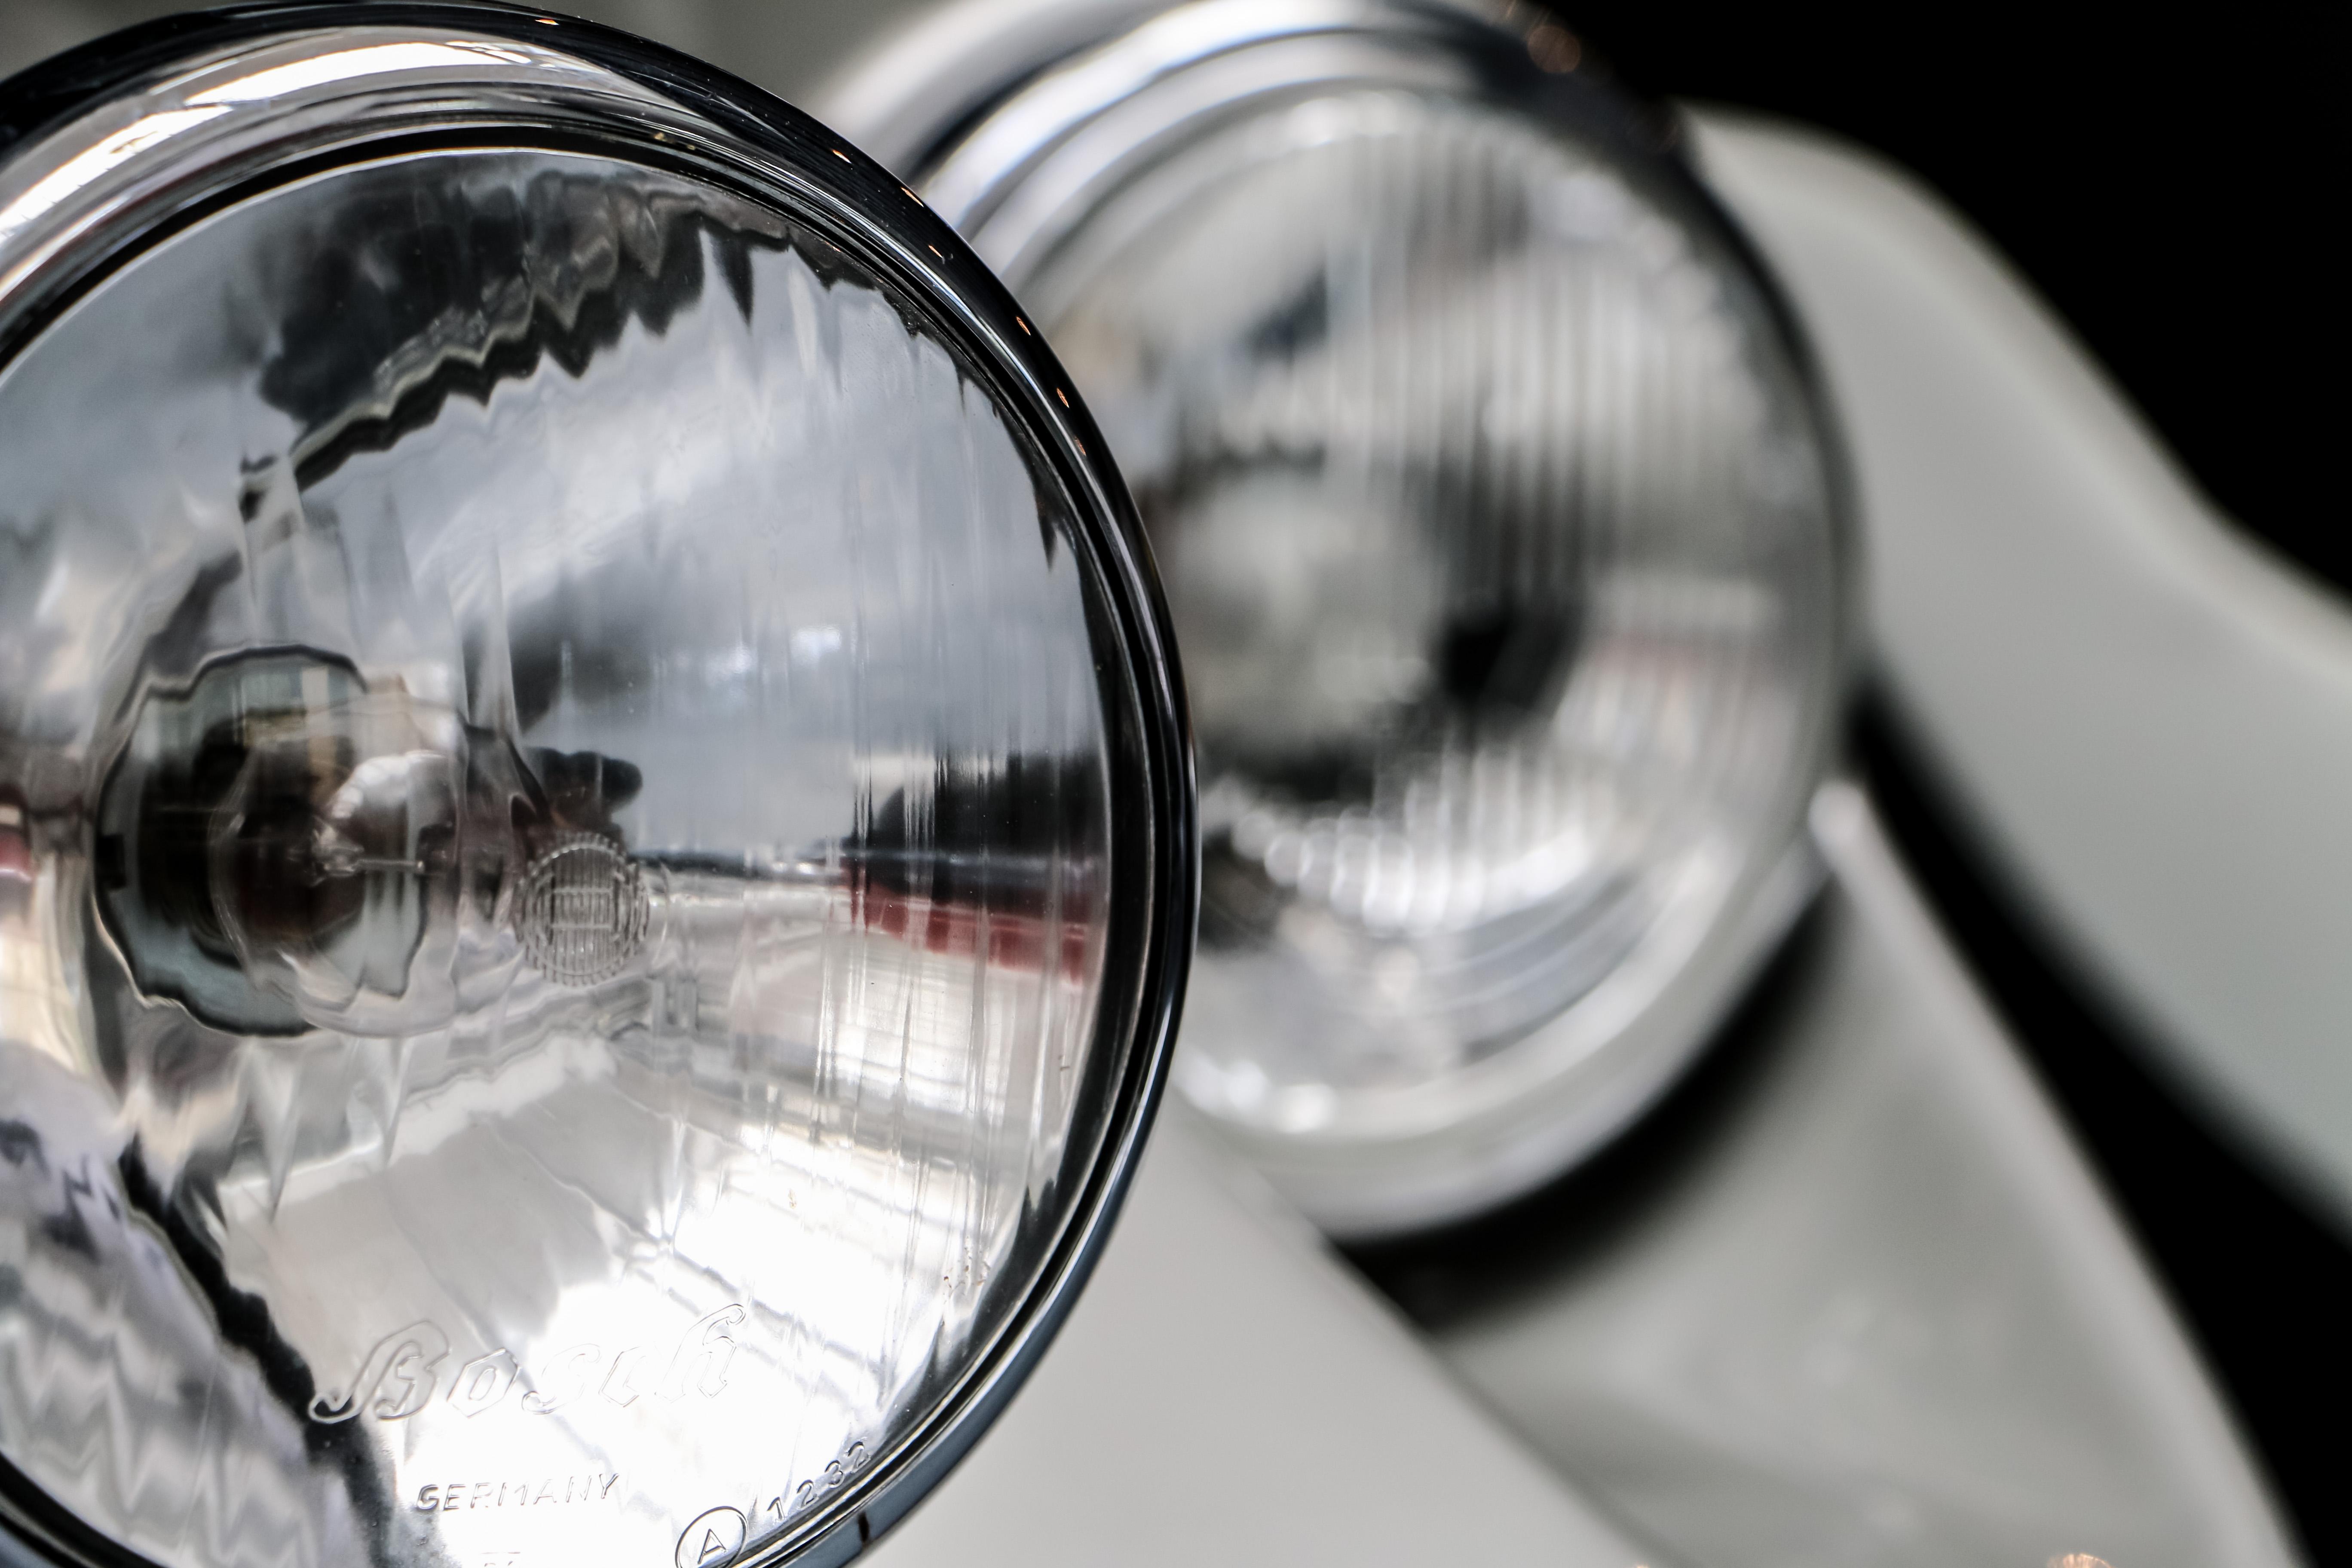 Round car Lights, Auto, Beautiful, Car, Dark, HQ Photo